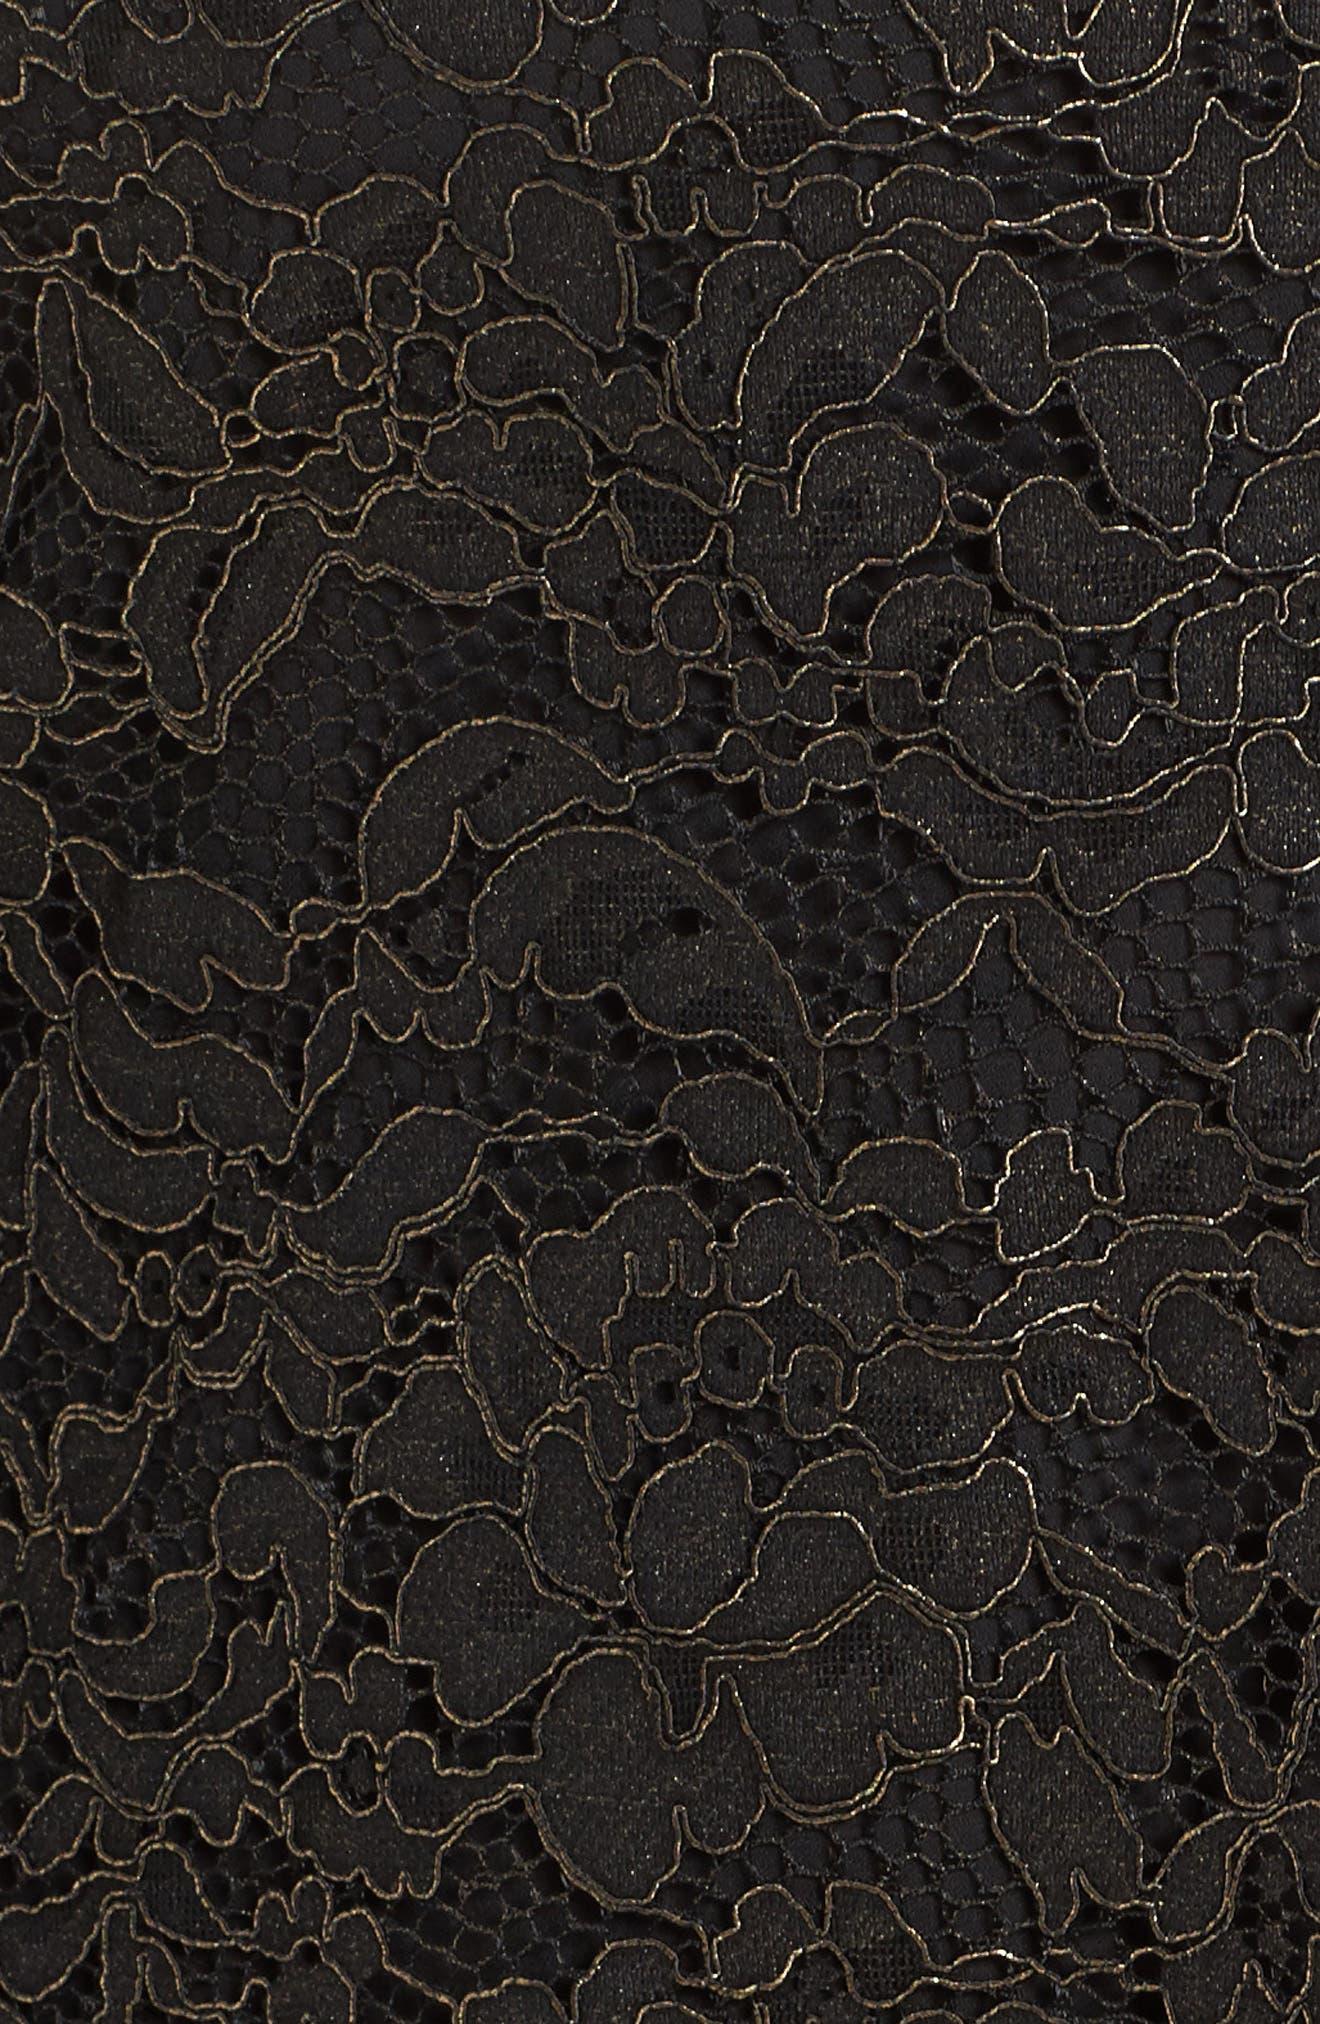 Off the Shoulder Black Gold Lace Dress,                             Alternate thumbnail 5, color,                             005